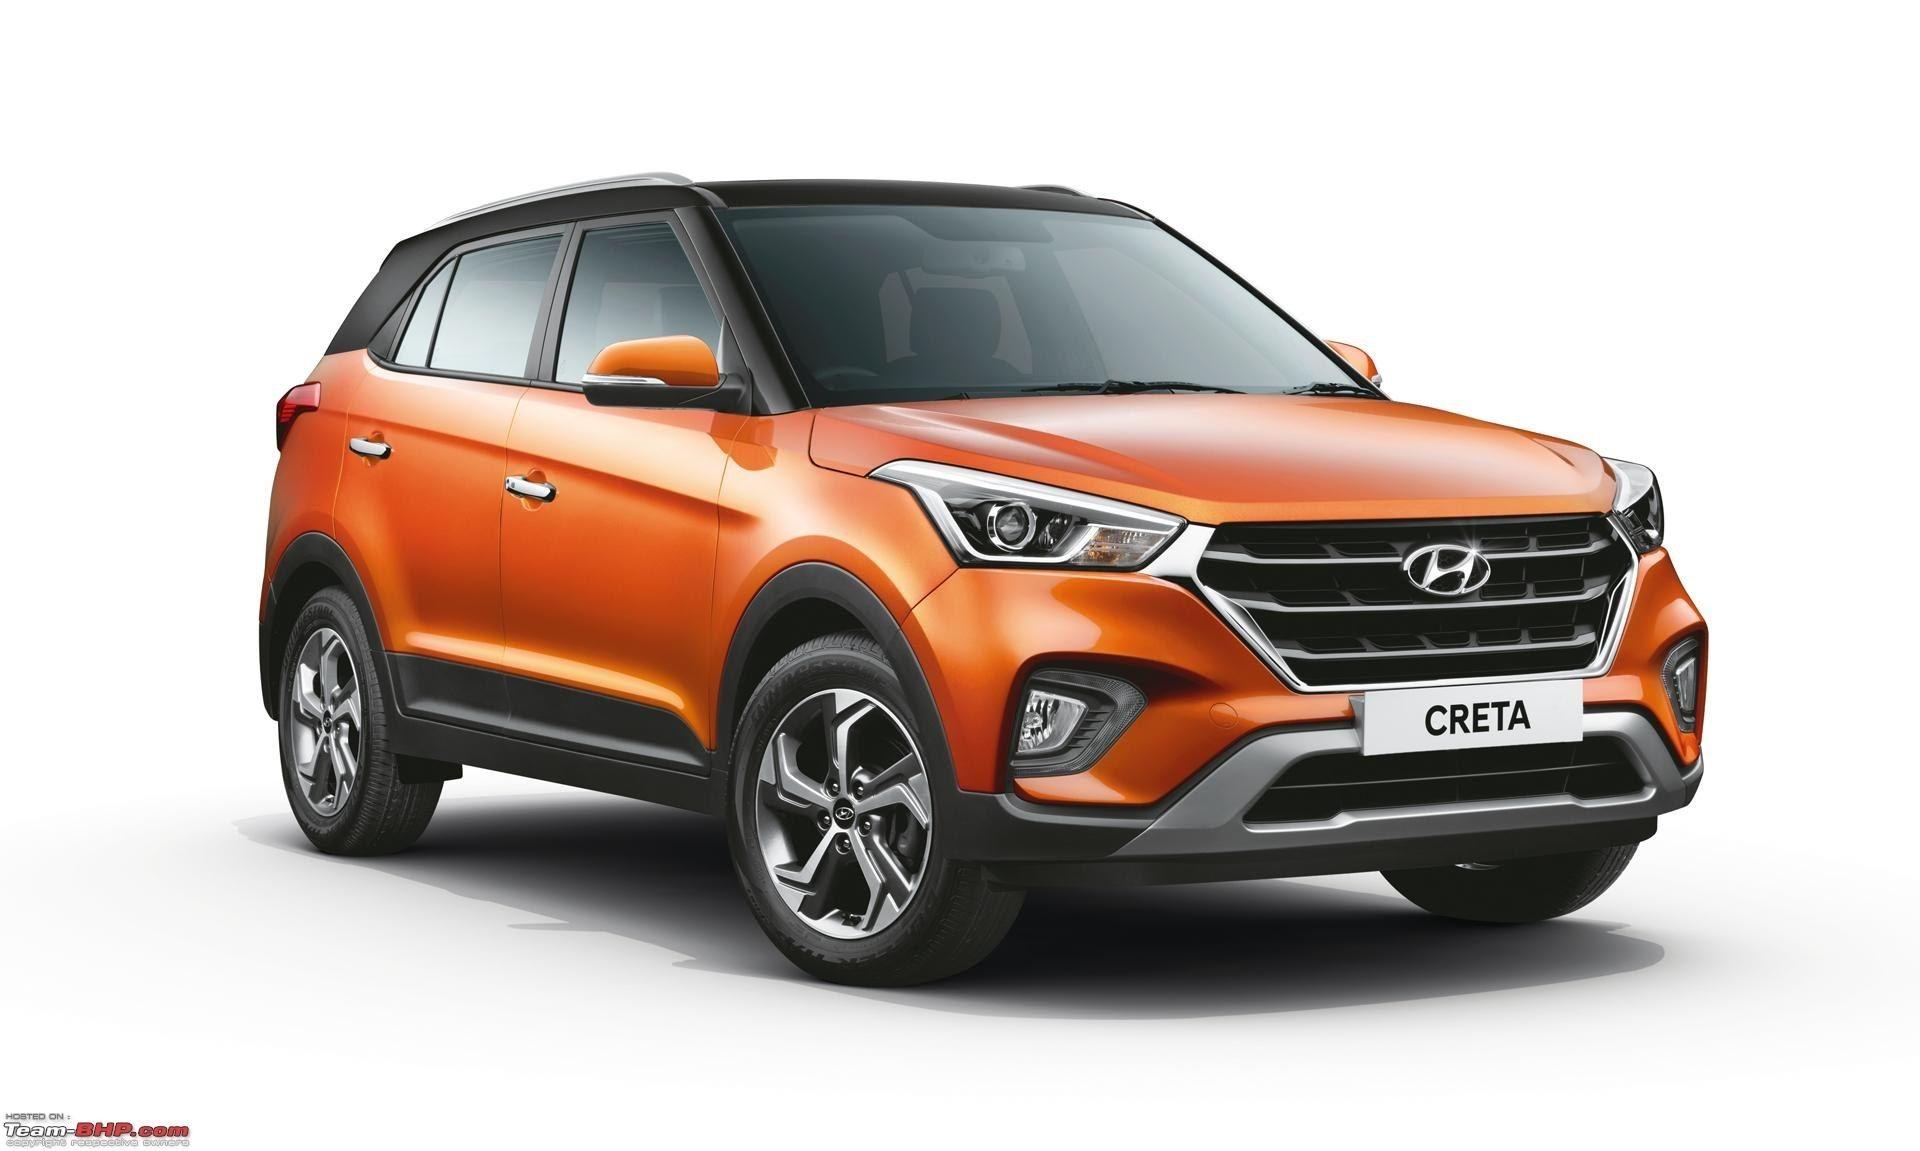 What Will The Hyundai I20 2020 India Look Like Hyundai Cars Hyundai Suv